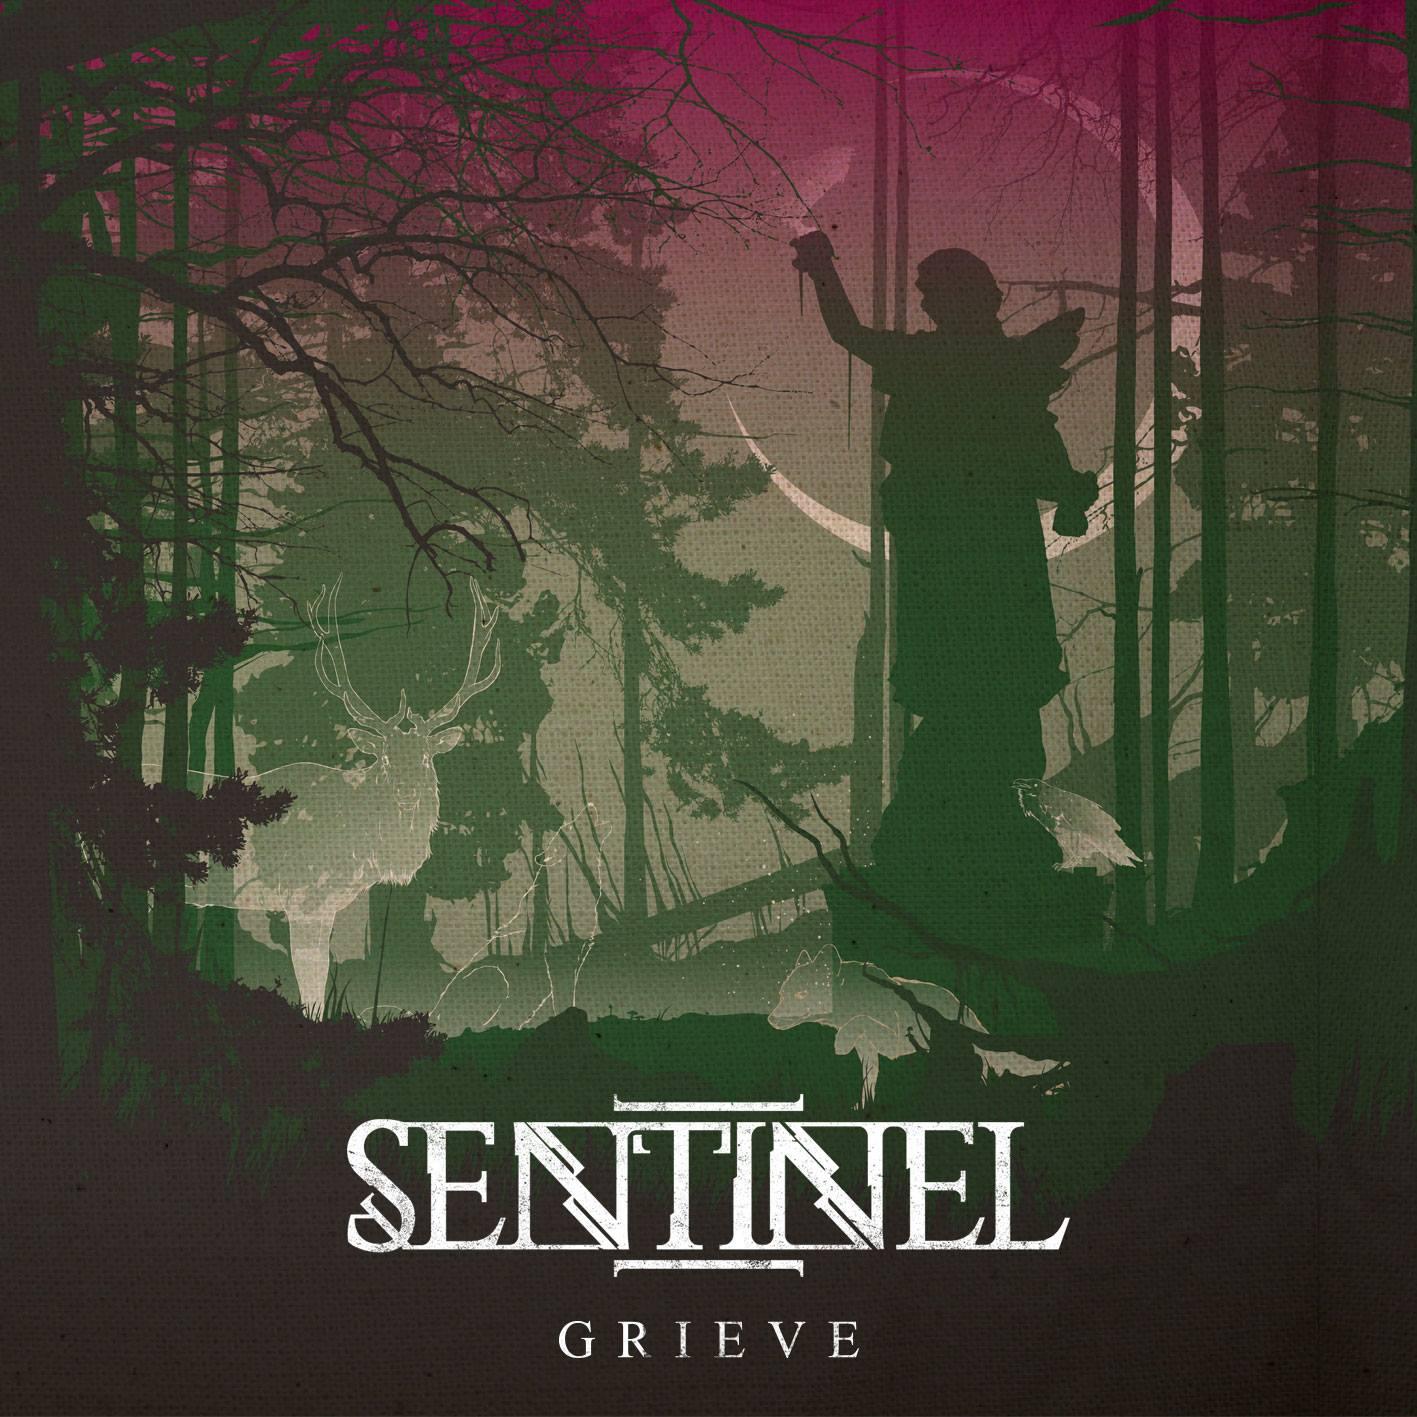 Sentinel - Grieve [single] (2016)